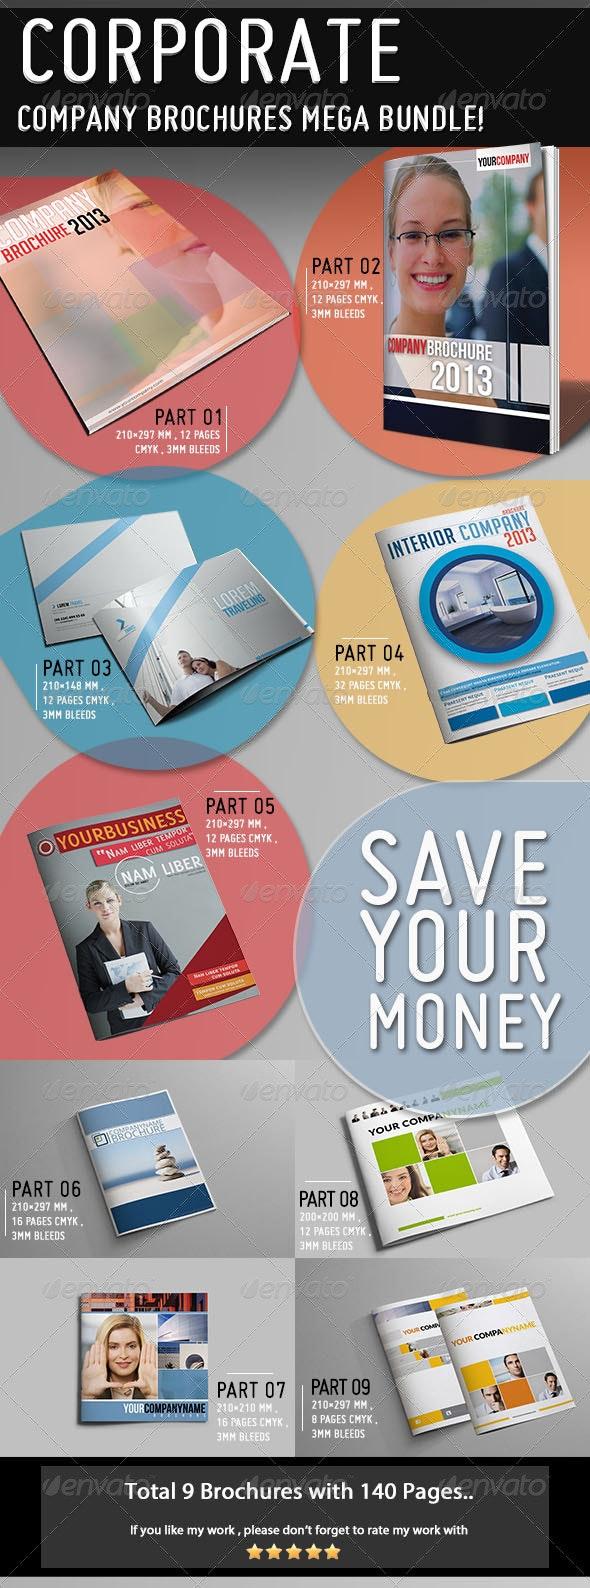 Mega Company Brochure Bundle - Corporate Brochures